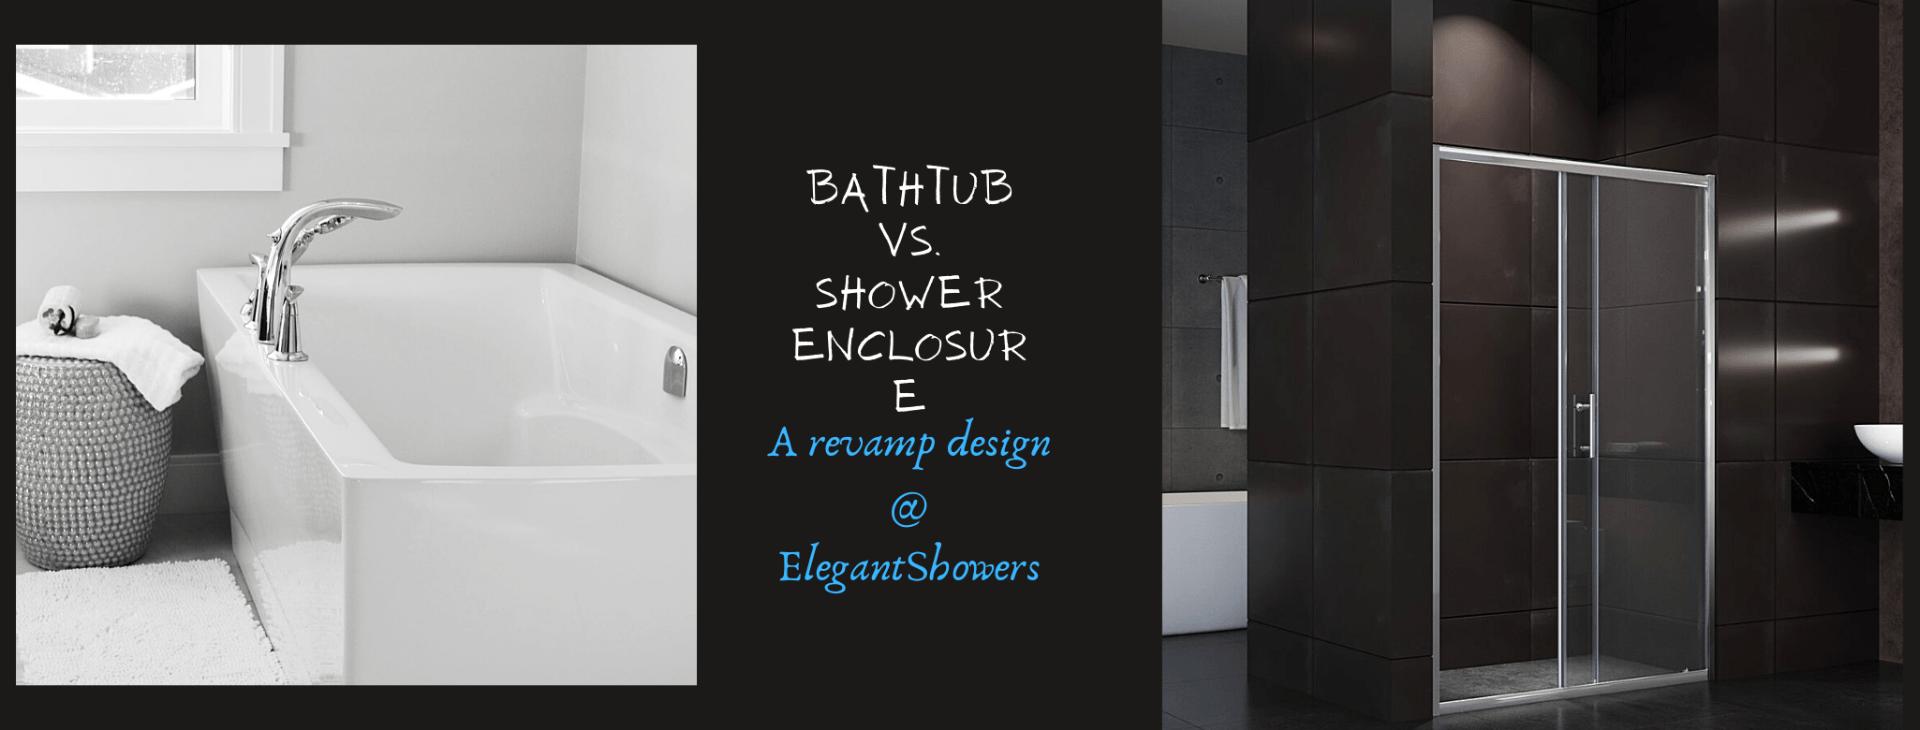 Bathtub Vs Shower Enclosure - Elegant Showers